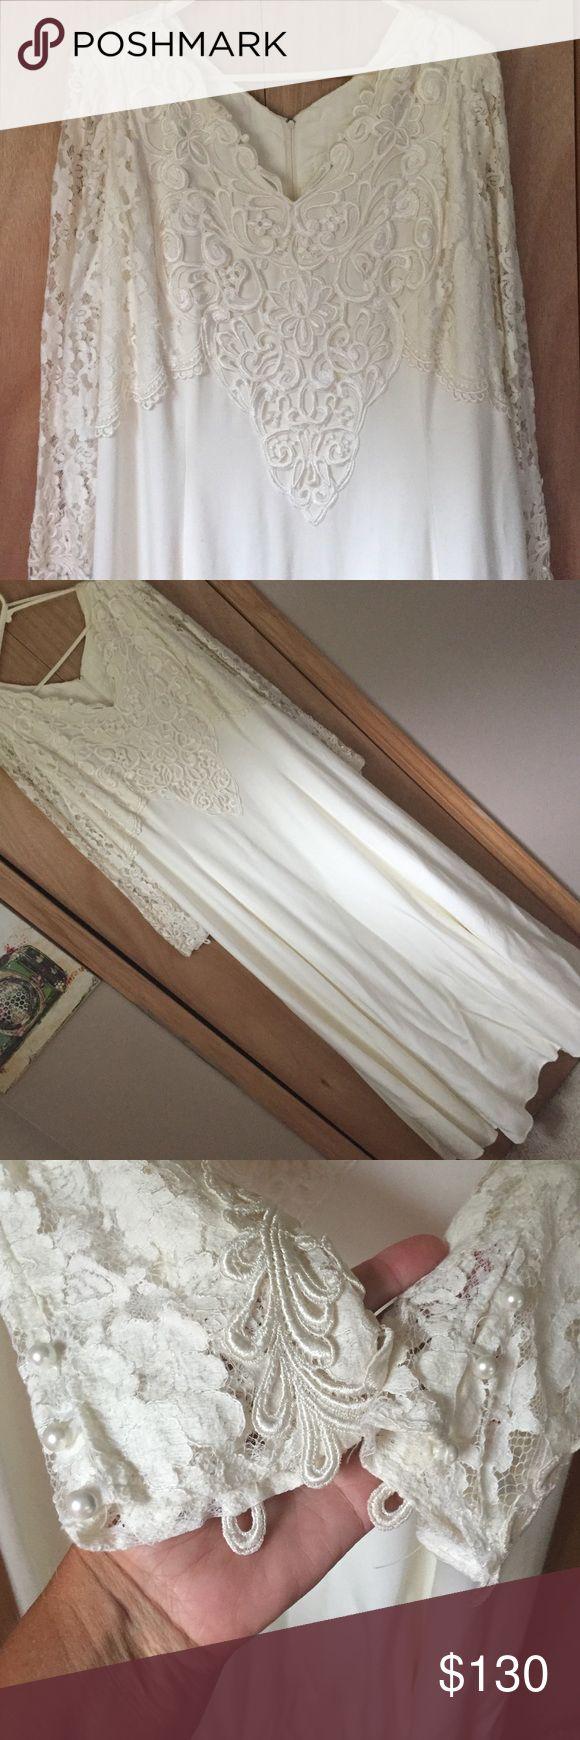 💍 Jessica McClintock Wedding Dress 💍 Light cream. Beautiful design. Sleeves are unique. Worn once. Little white buttons on cuffs. Jessica McClintock Dresses Wedding